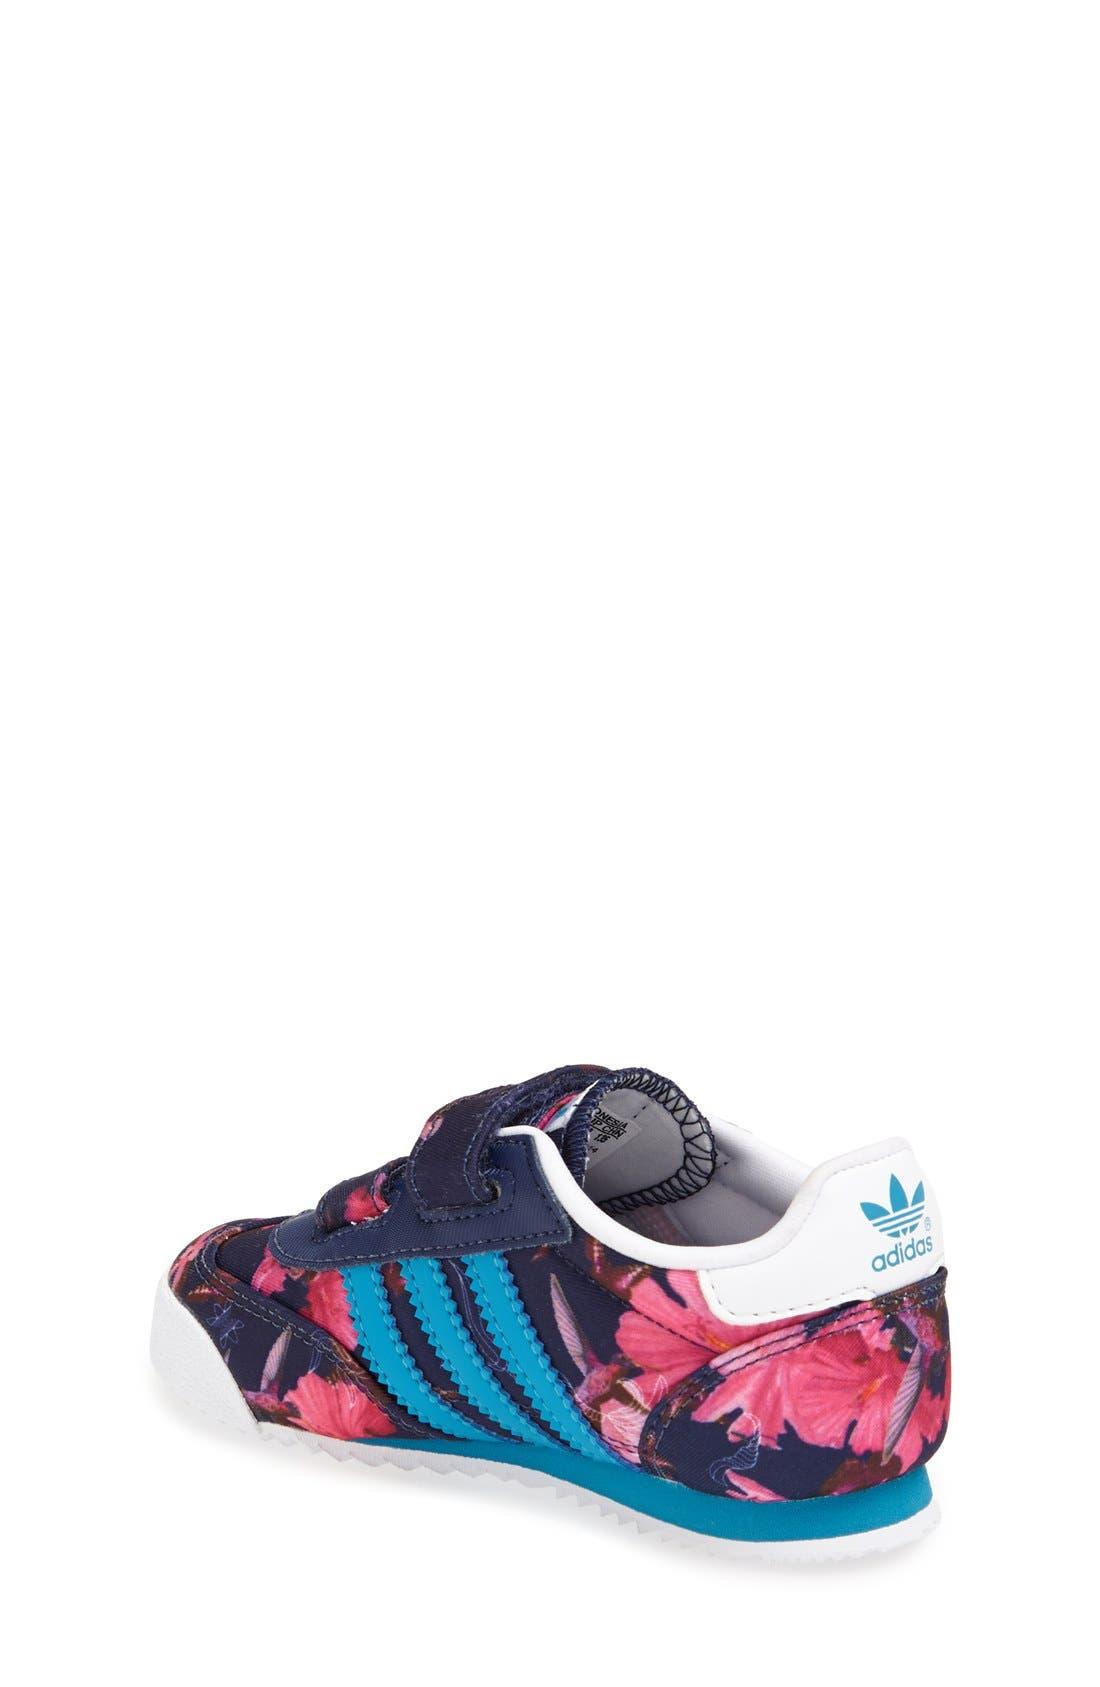 'Dragon - Floral' Sneaker,                             Alternate thumbnail 4, color,                             100